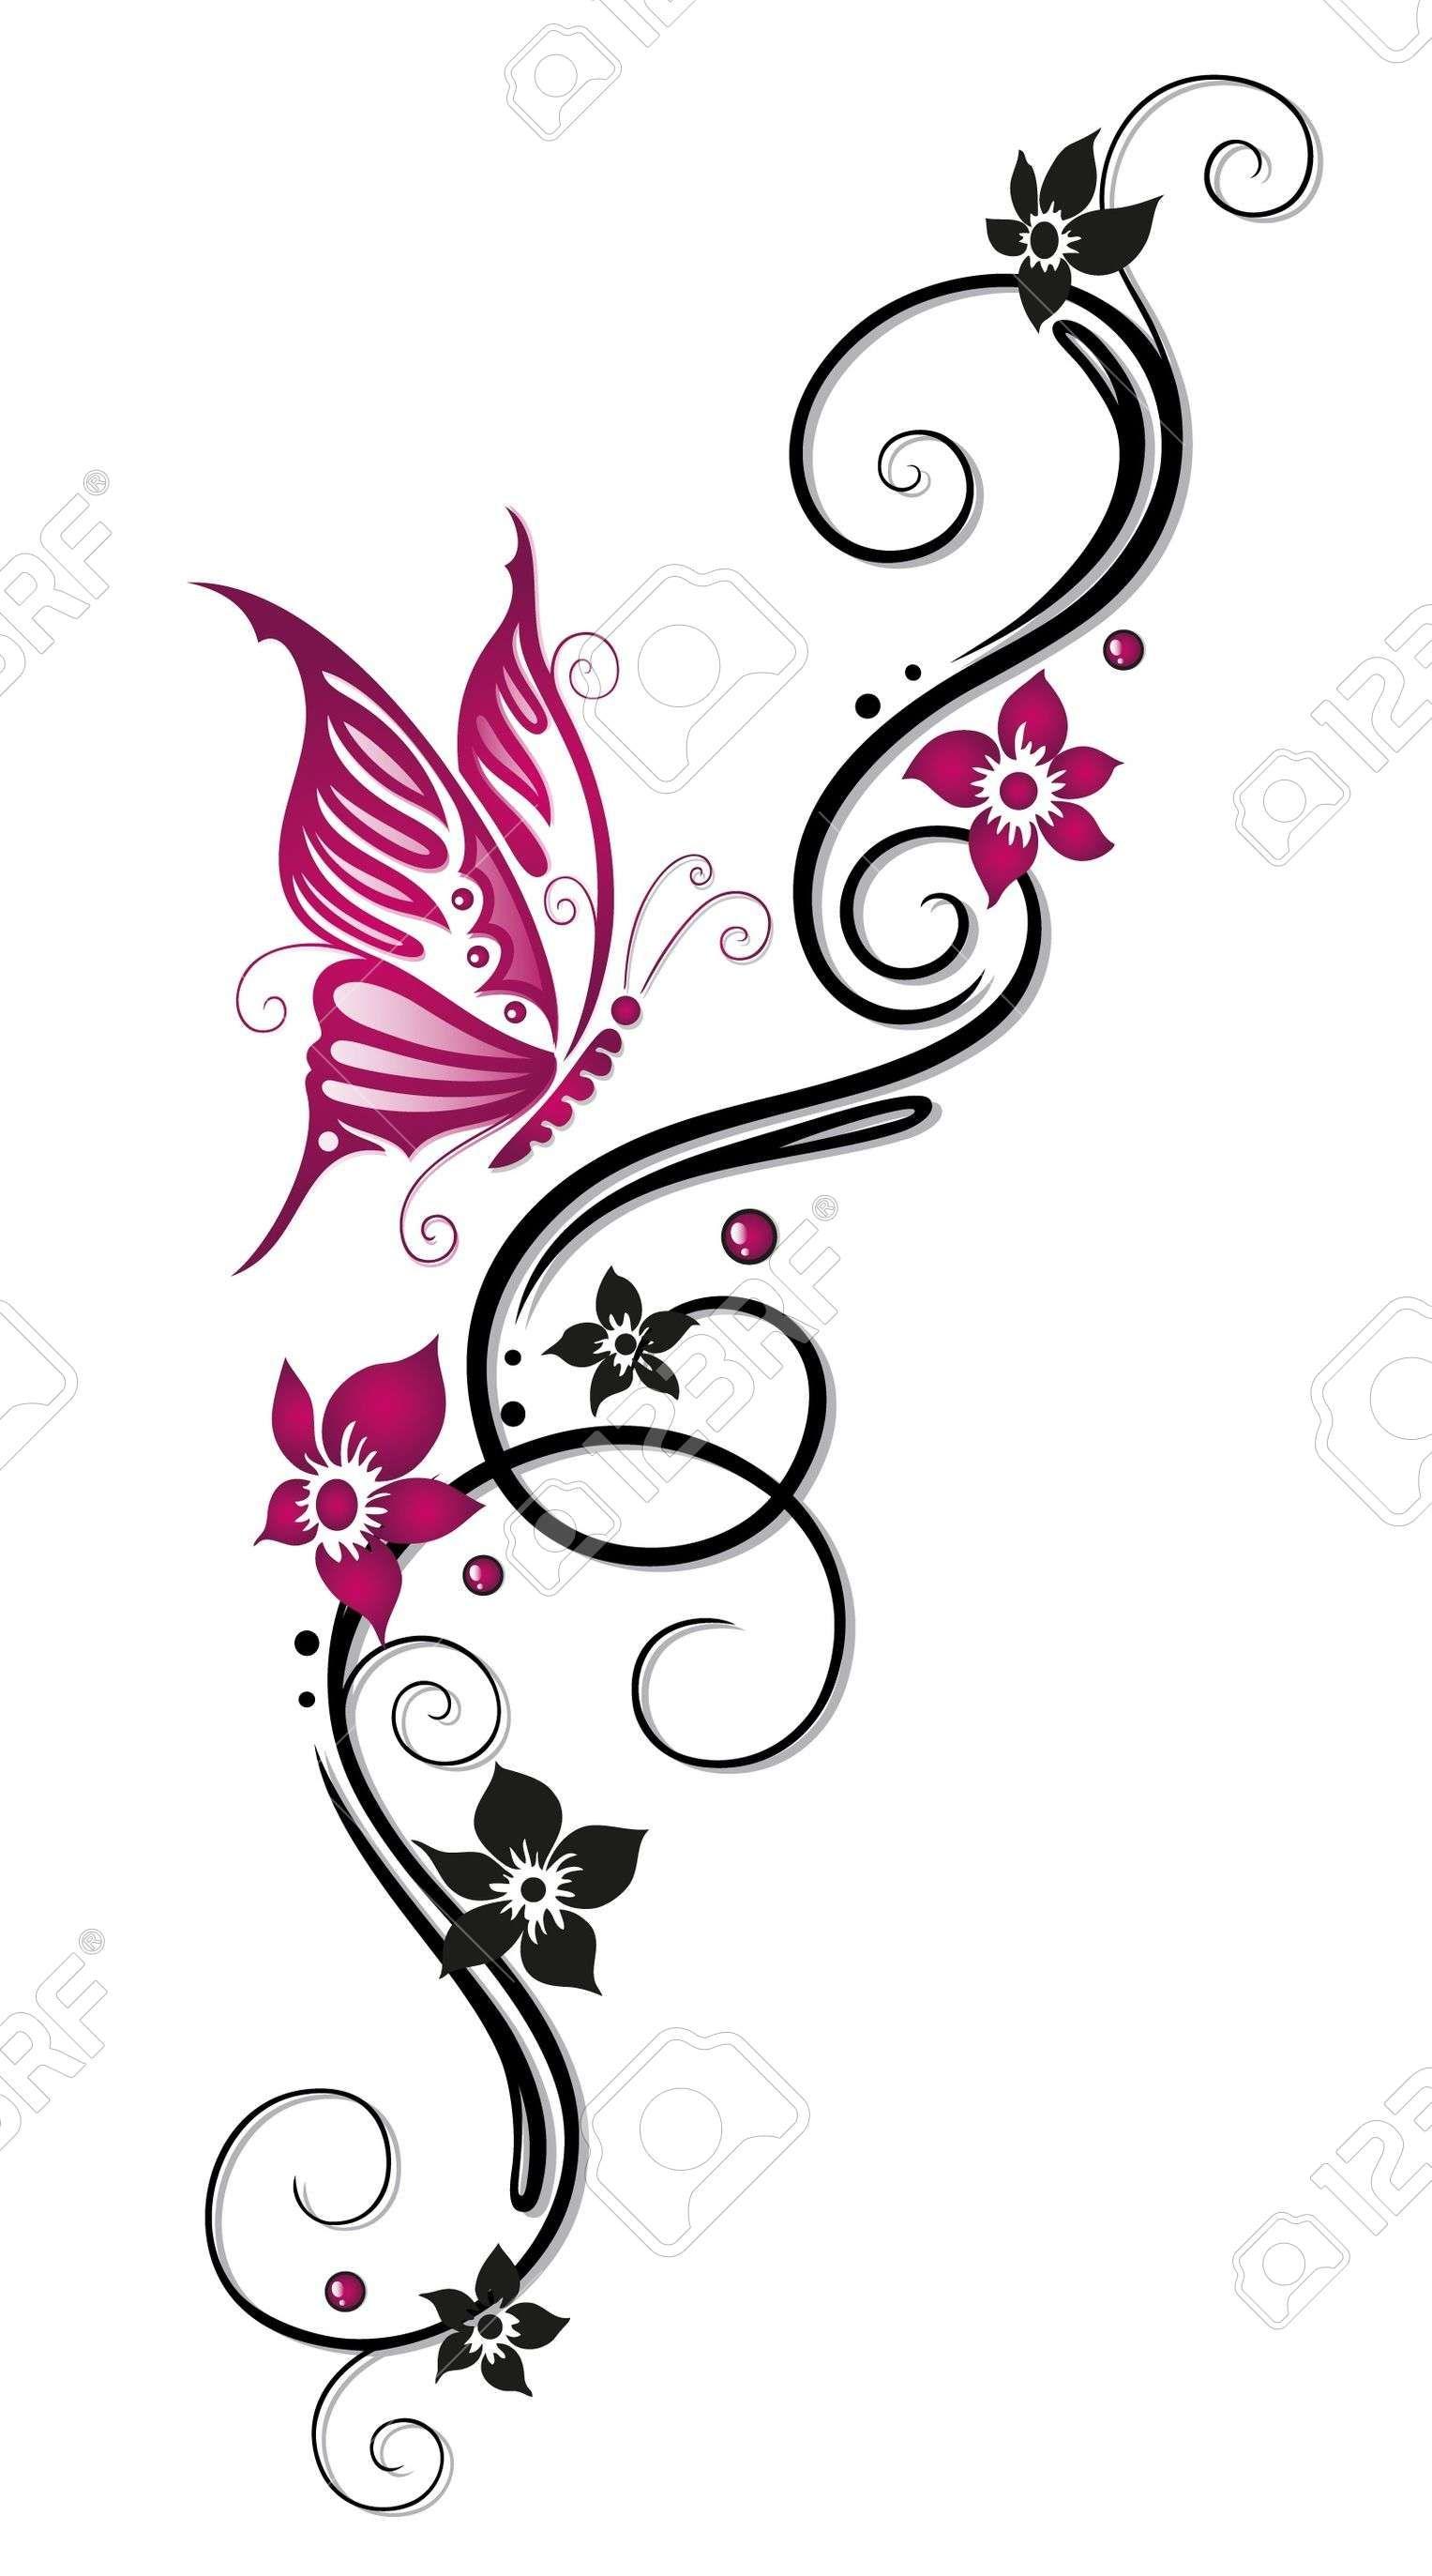 floral tribal tatouage en noir et rose modele pinterest tatouage tatouage papillon et. Black Bedroom Furniture Sets. Home Design Ideas